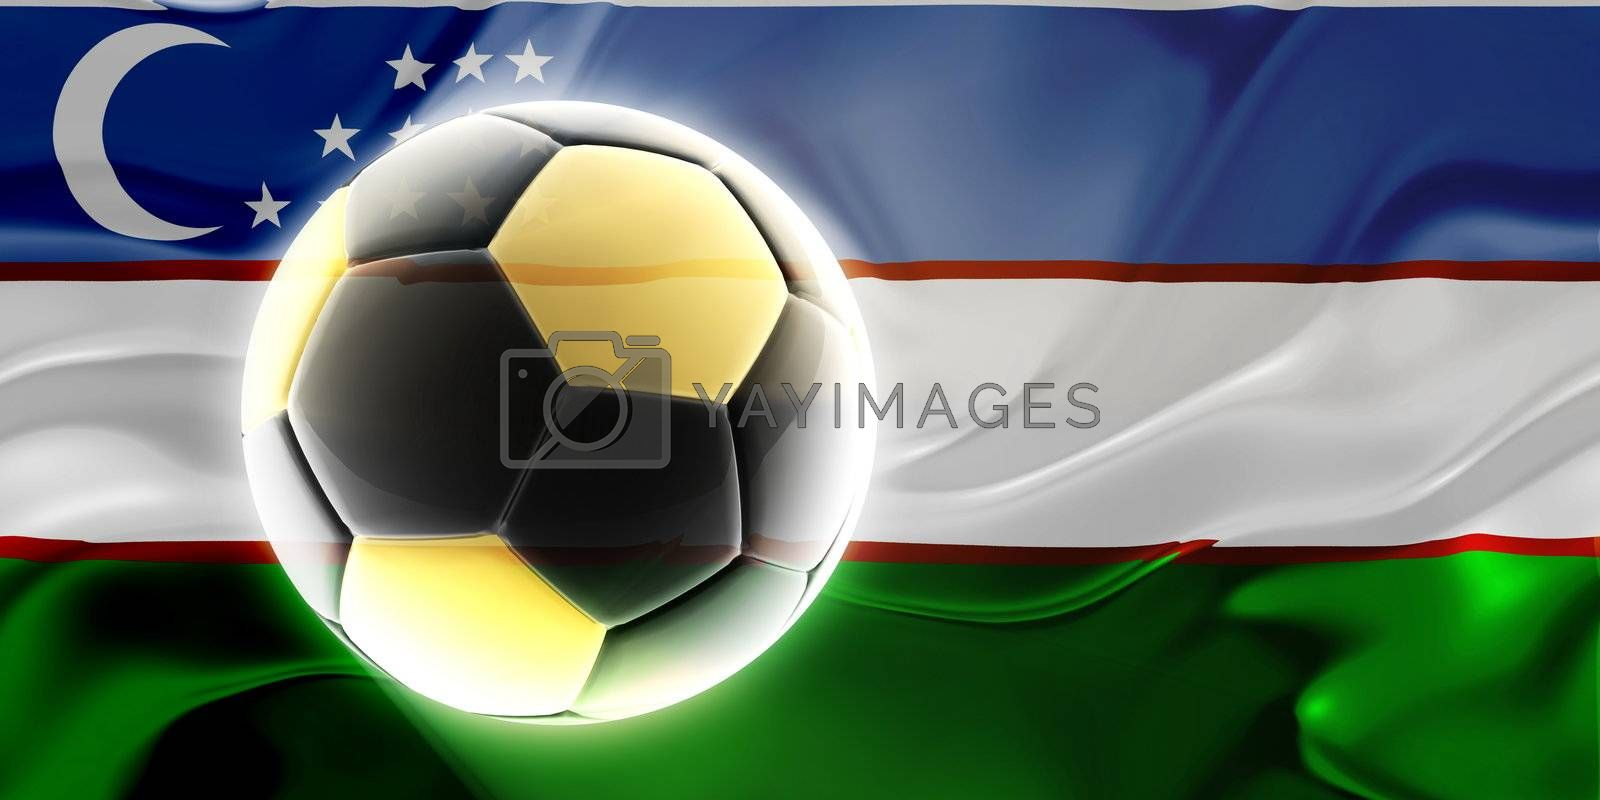 Flag of Uzbekistan, national country symbol illustration wavy fabric sports soccer football